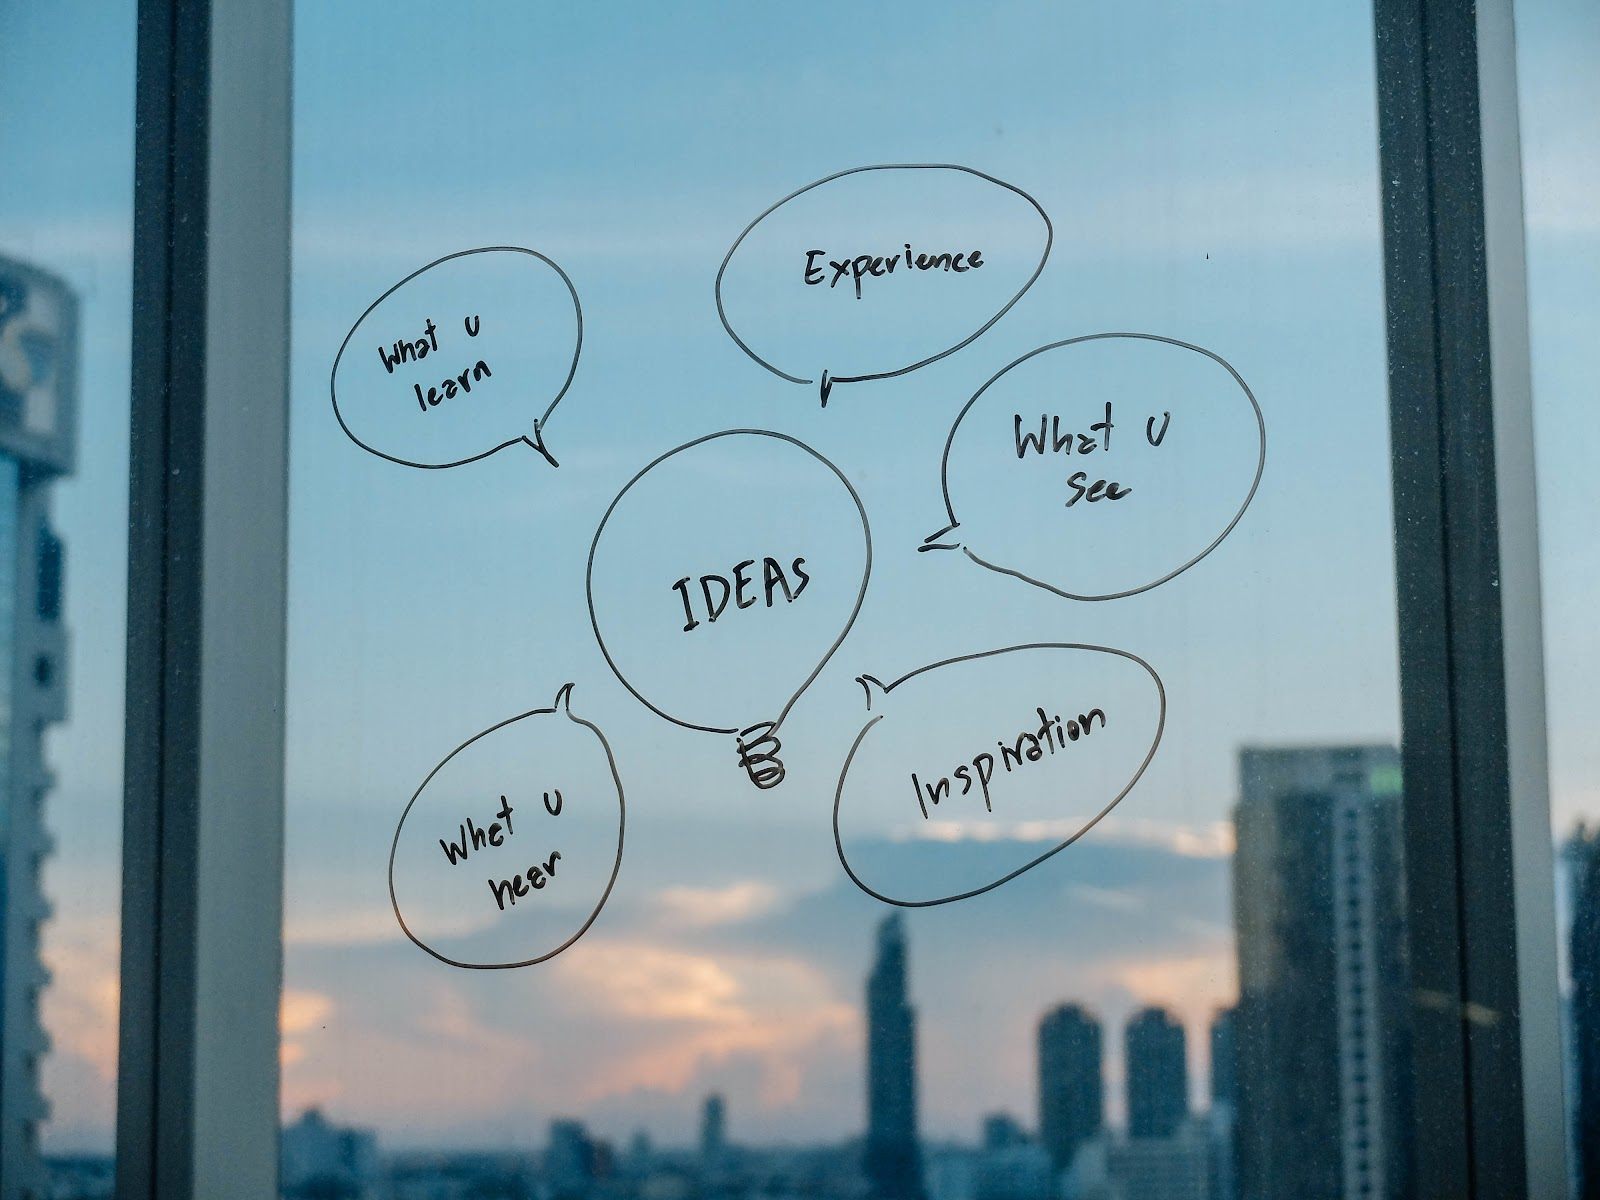 idea bubbles, inspiration, creativity, msp, management, ring groups